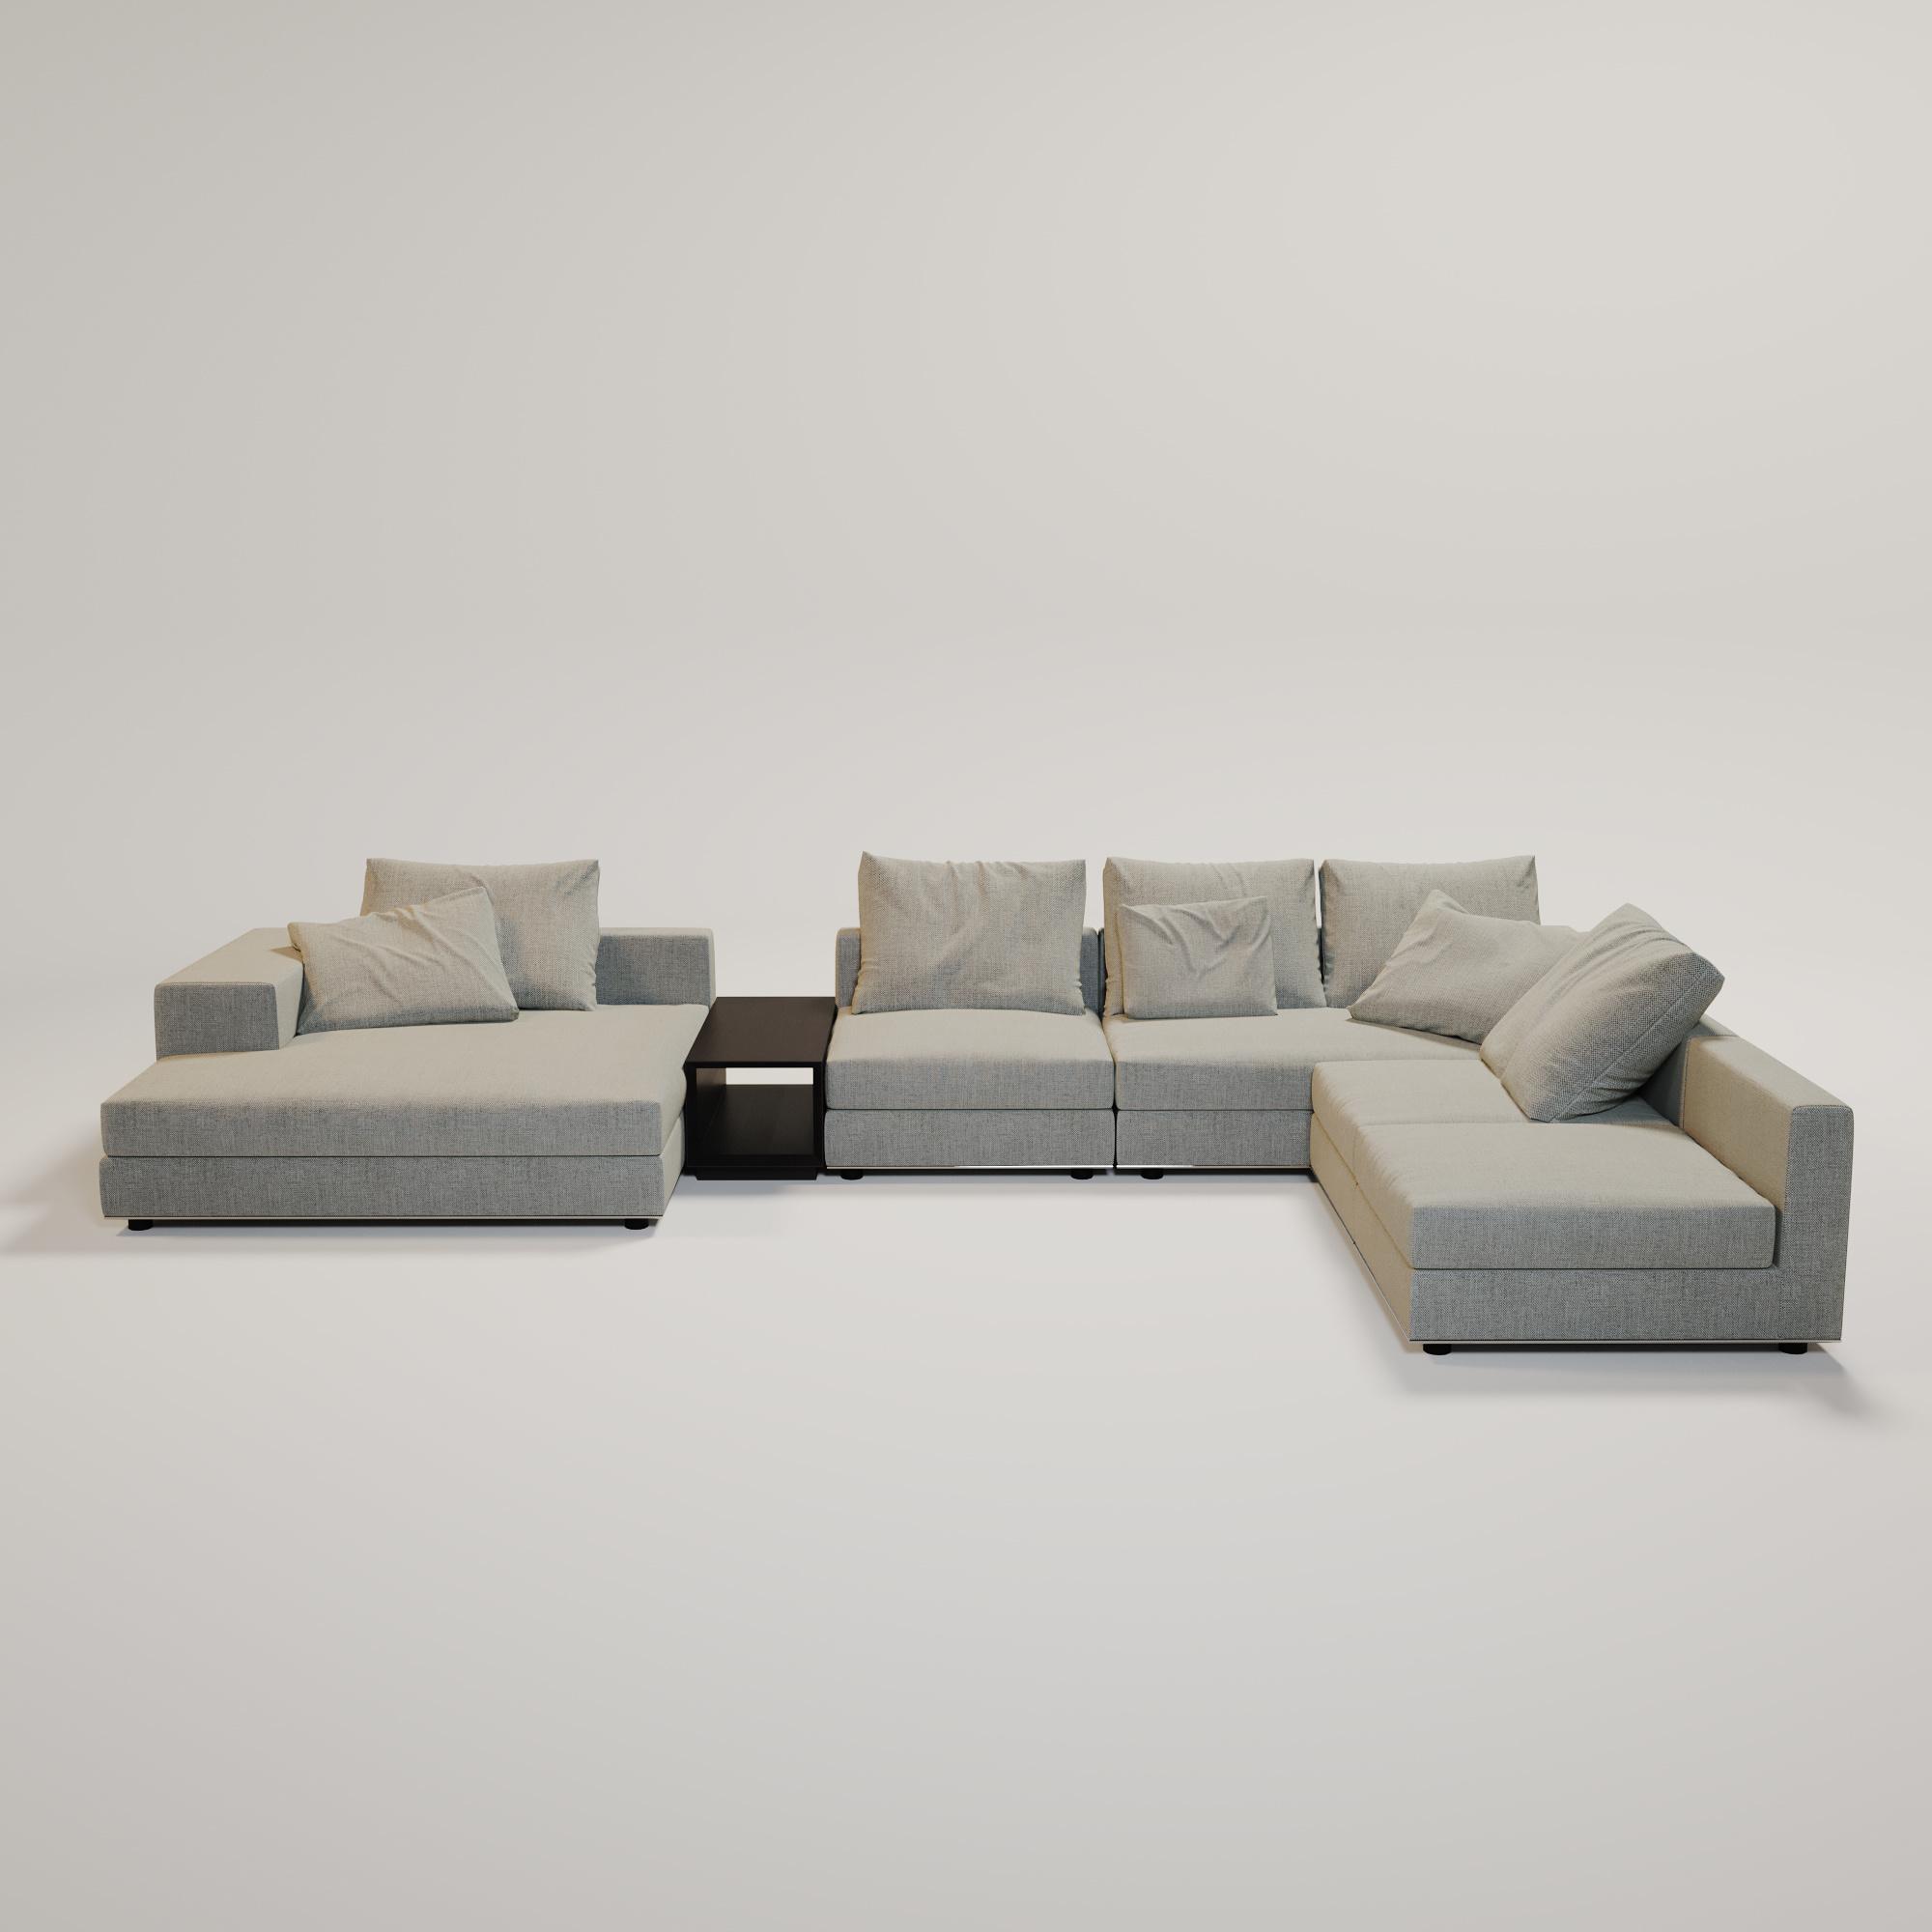 MASSIMO  Sofa Grey weave fabric-2